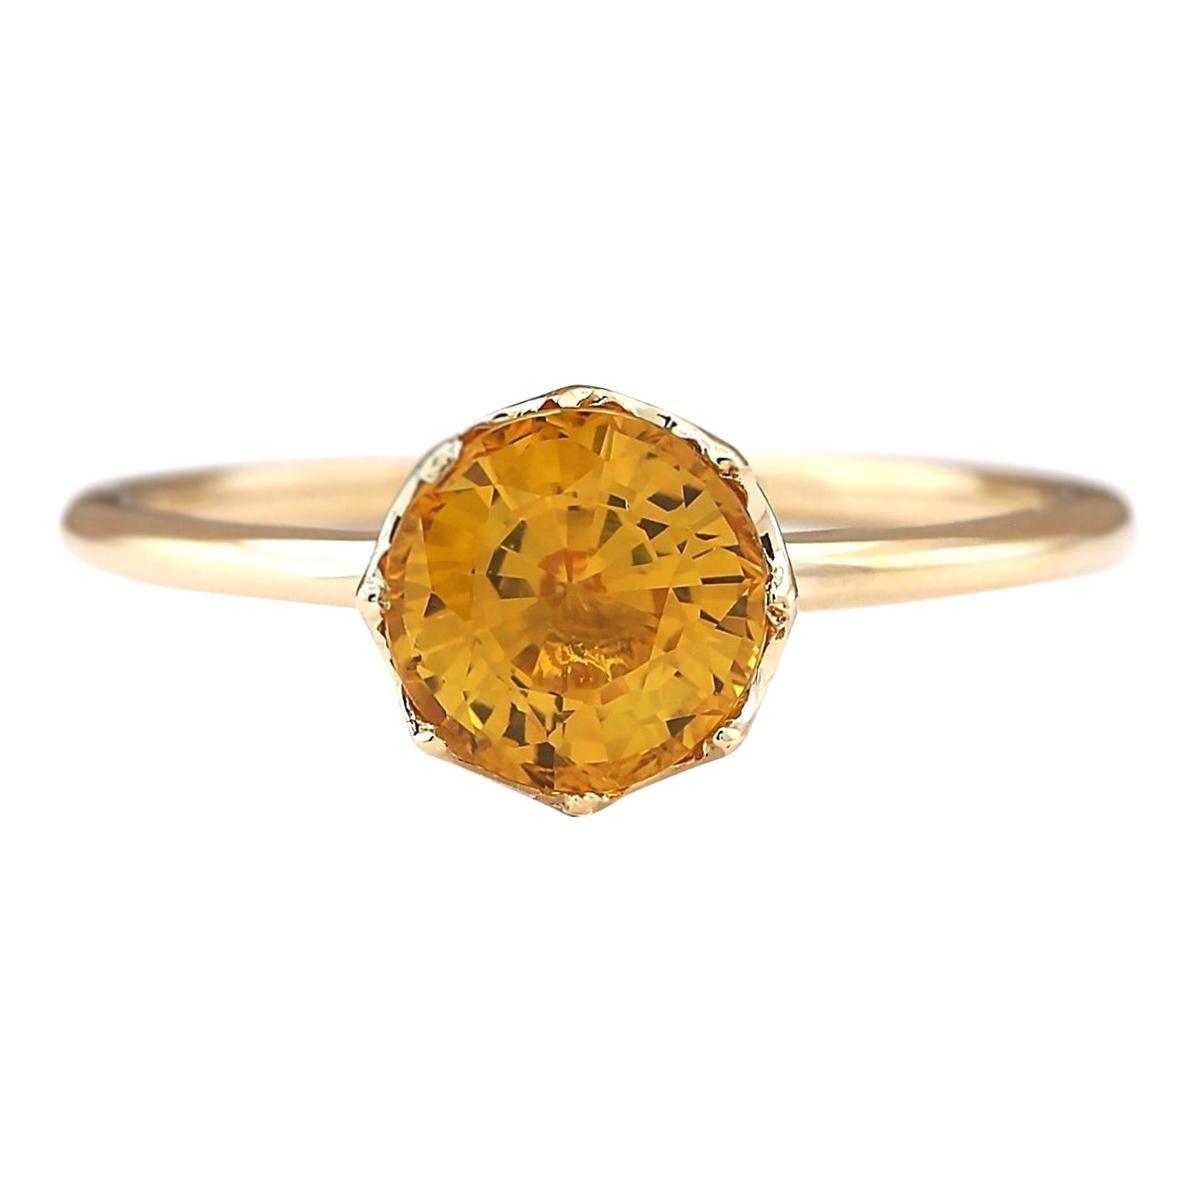 1.80 Carat Natural Sapphire 18 Karat Yellow Gold Ring